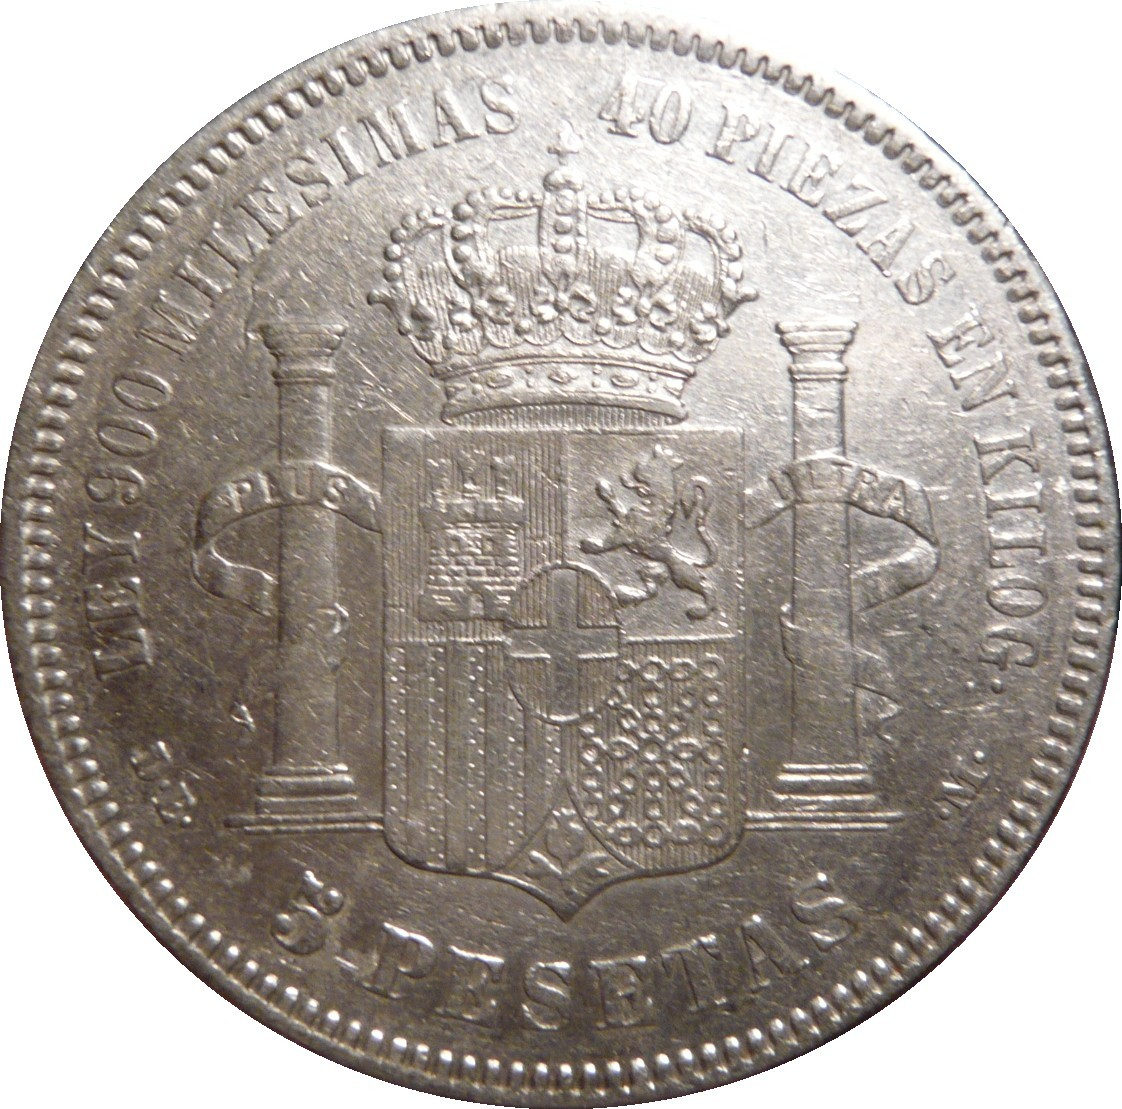 Spain 5 Pesetas (1871 Amadeo I)